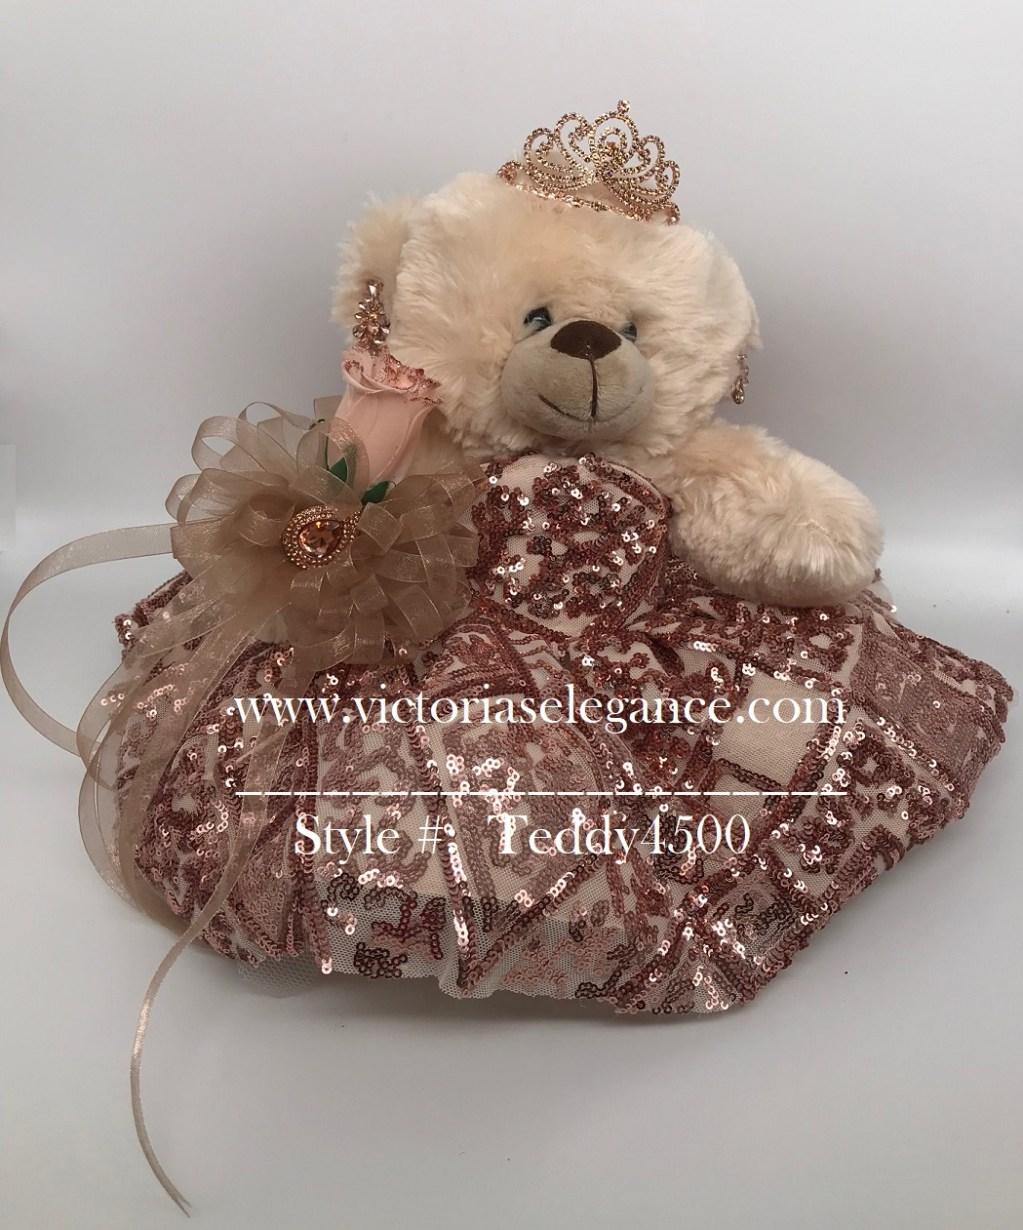 Teddy4500B